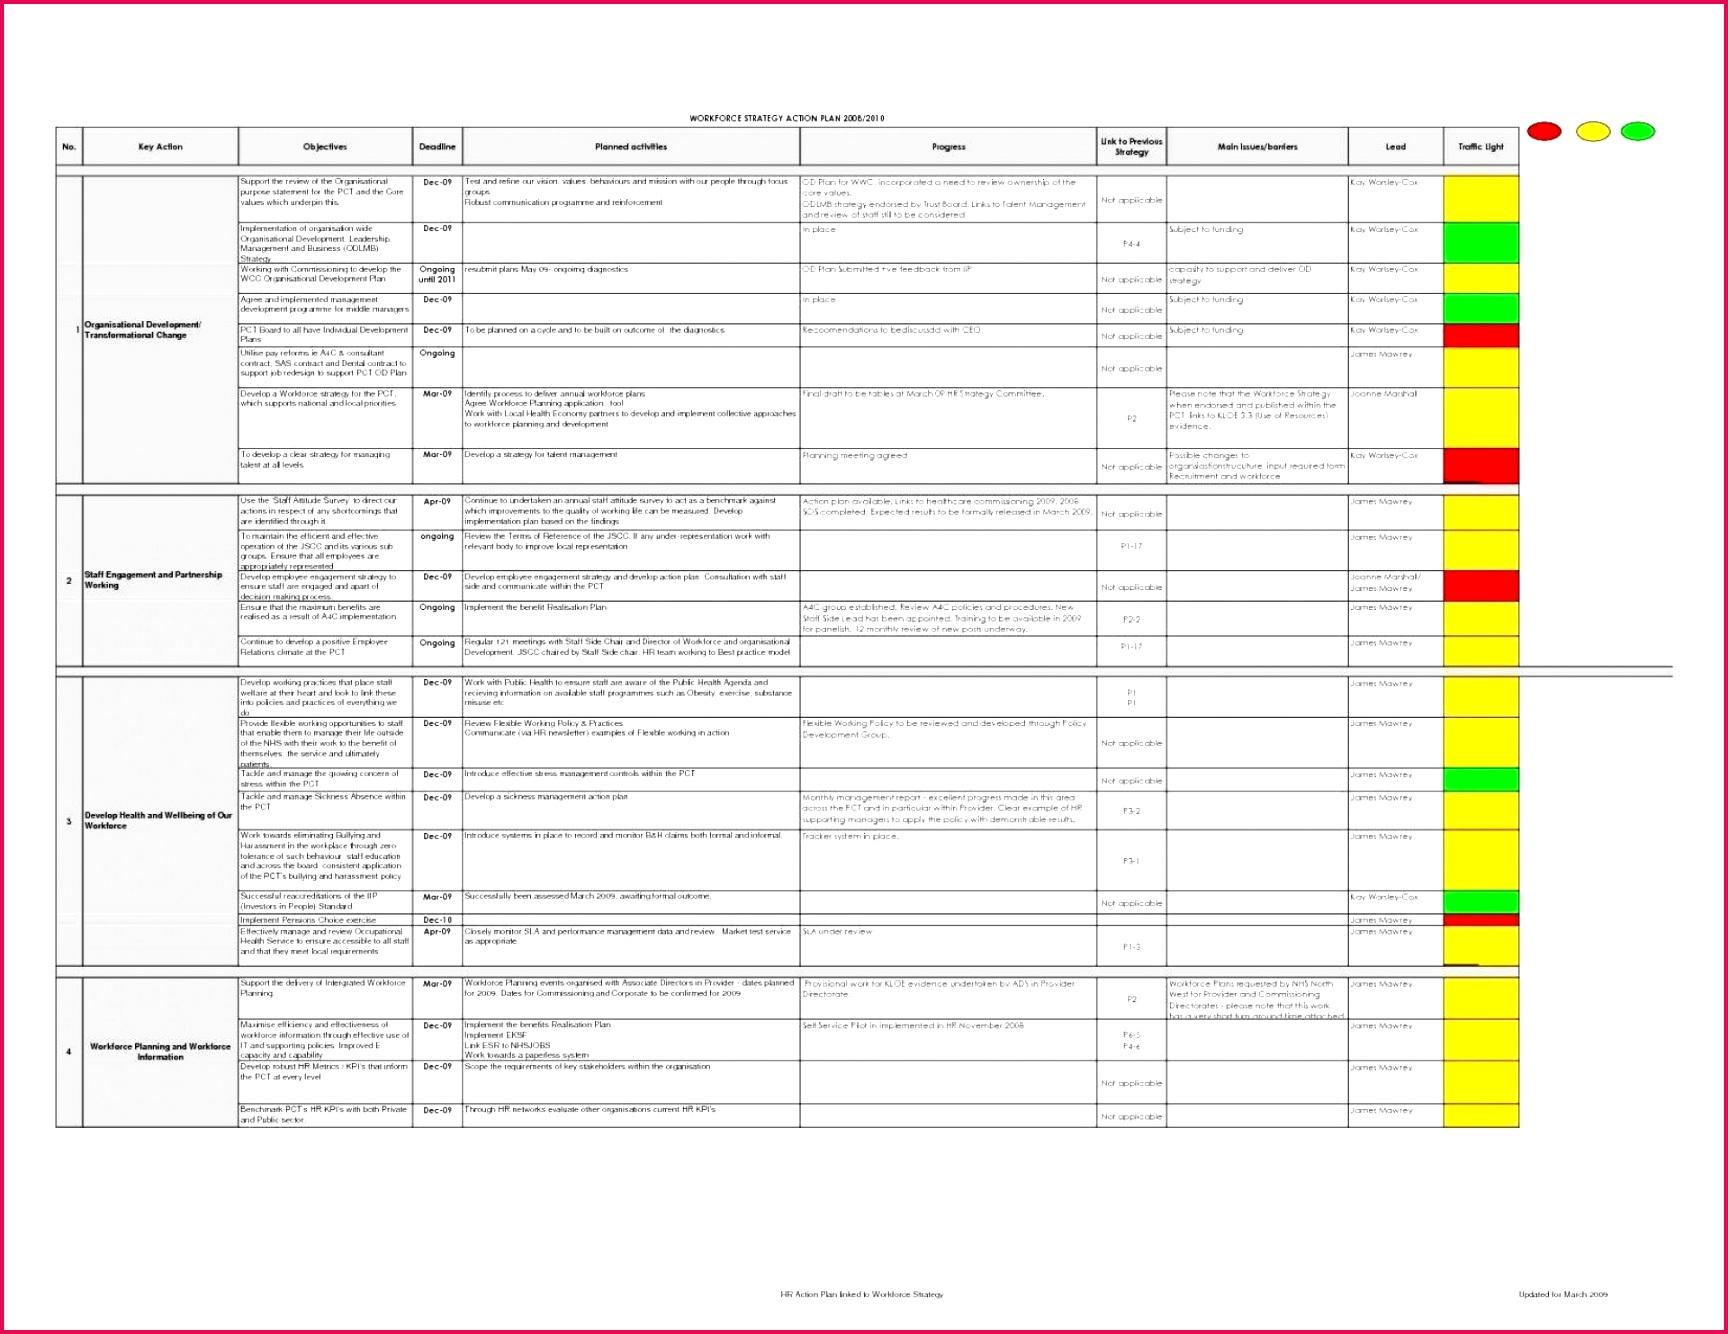 032 manual handling certificates template cool employee training plan word superb survey of 1920x1484